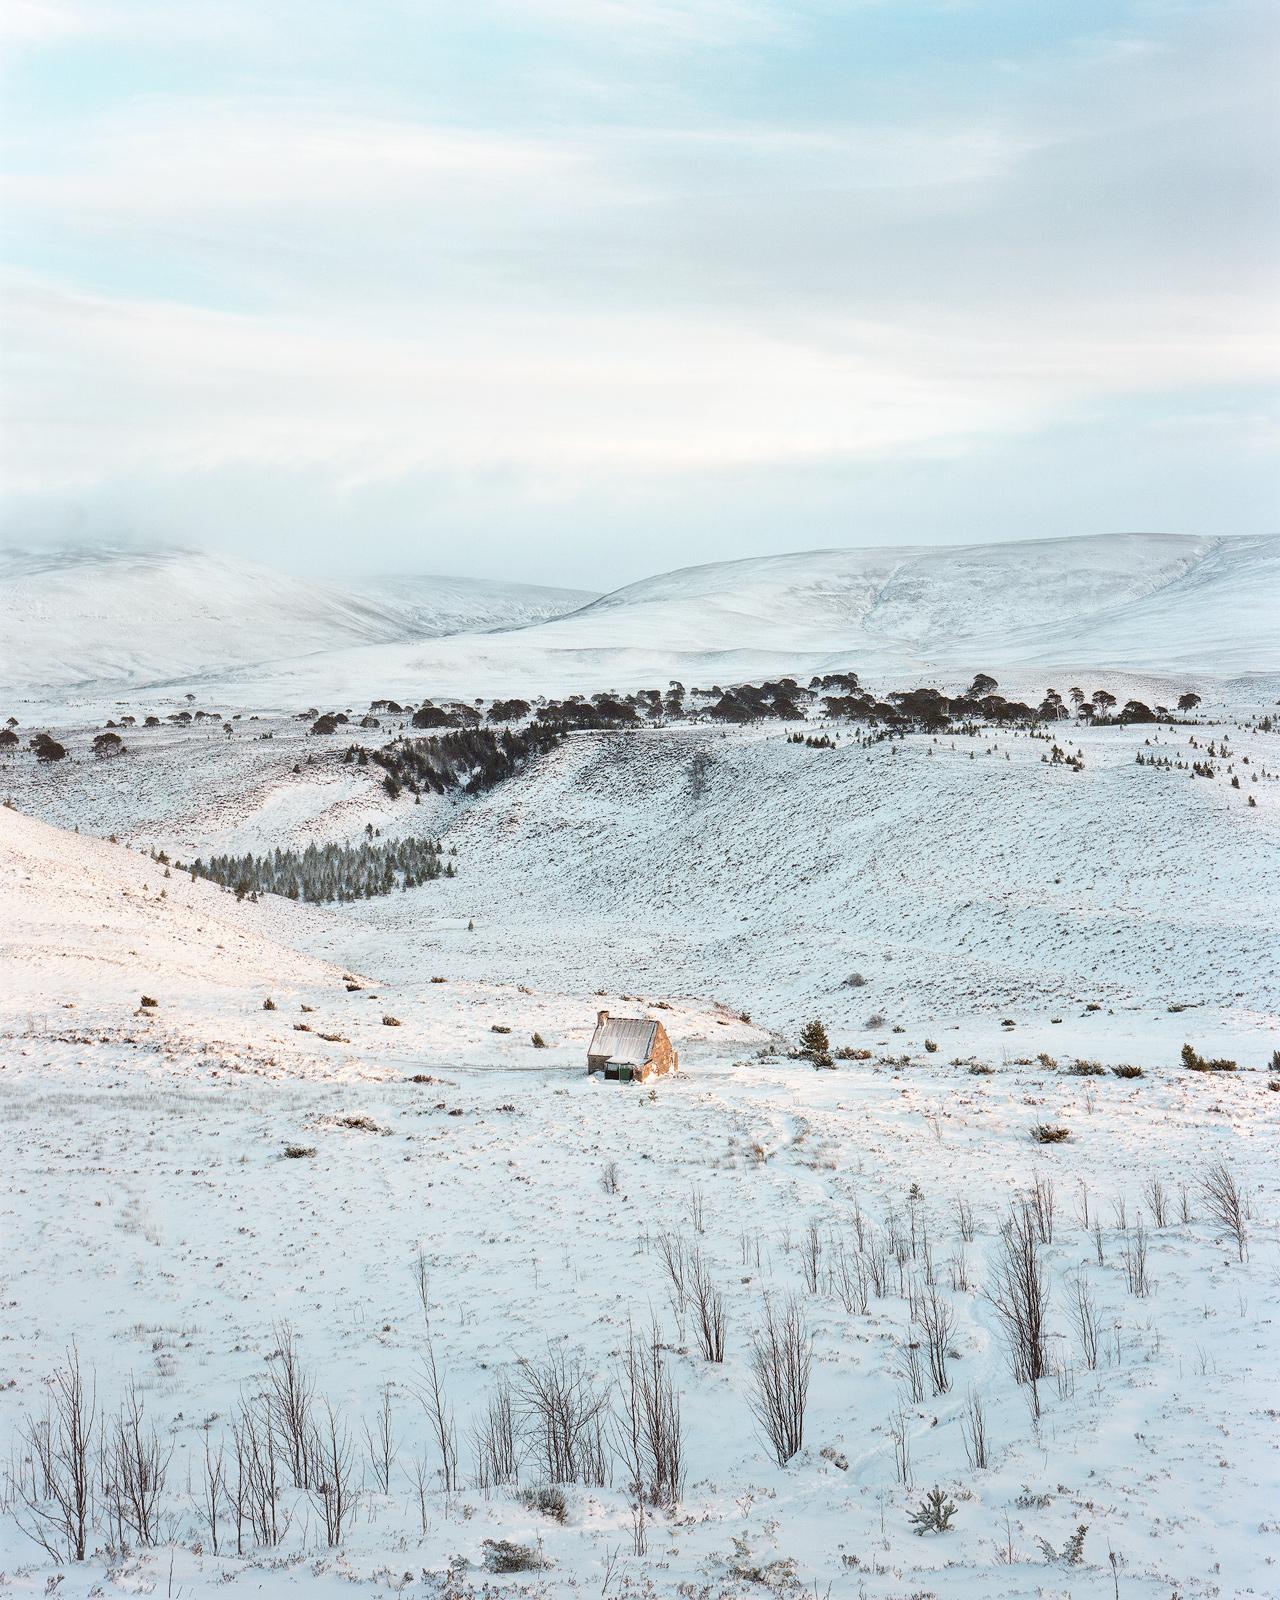 nicholaswhite_Ryvoan, Cairngorm Mountains, Scotland.jpg